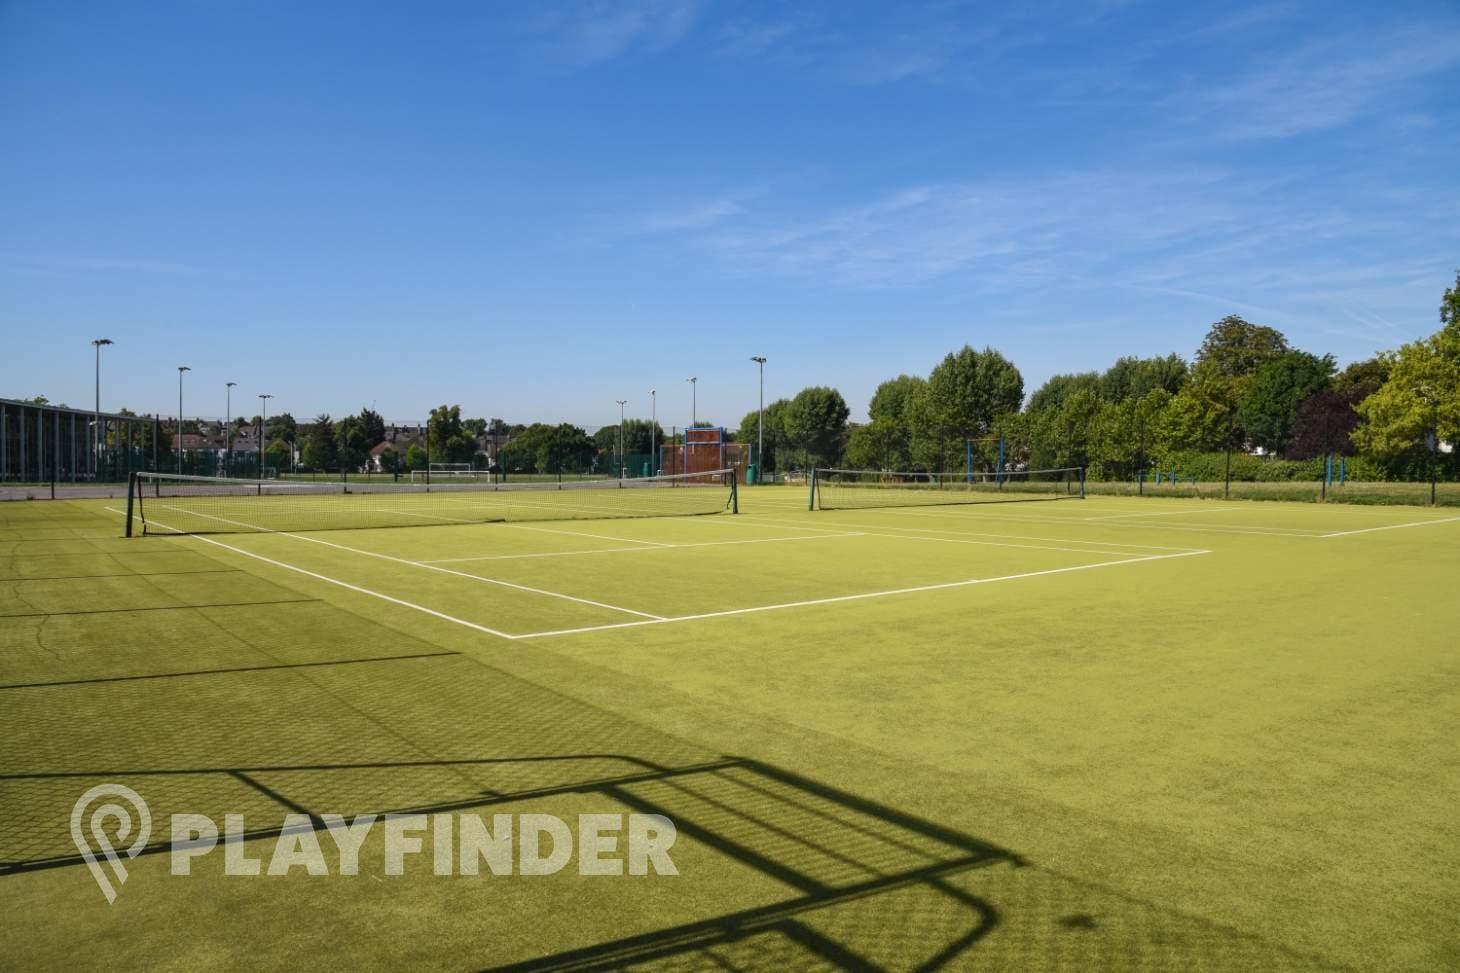 Capital City Academy Court | Sand-based Astroturf tennis court